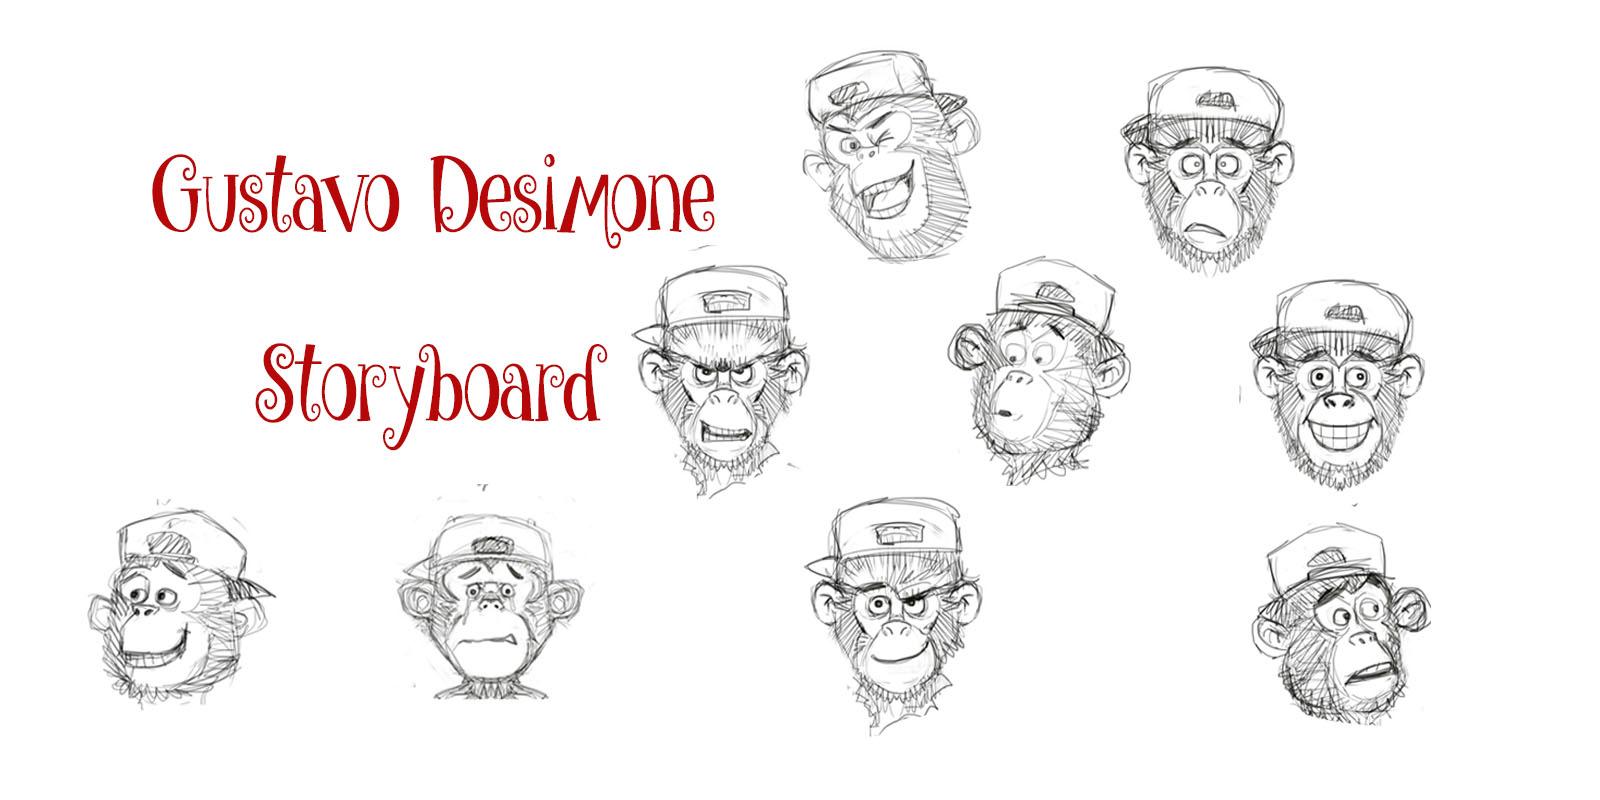 Gustavo Desimone Storyboard